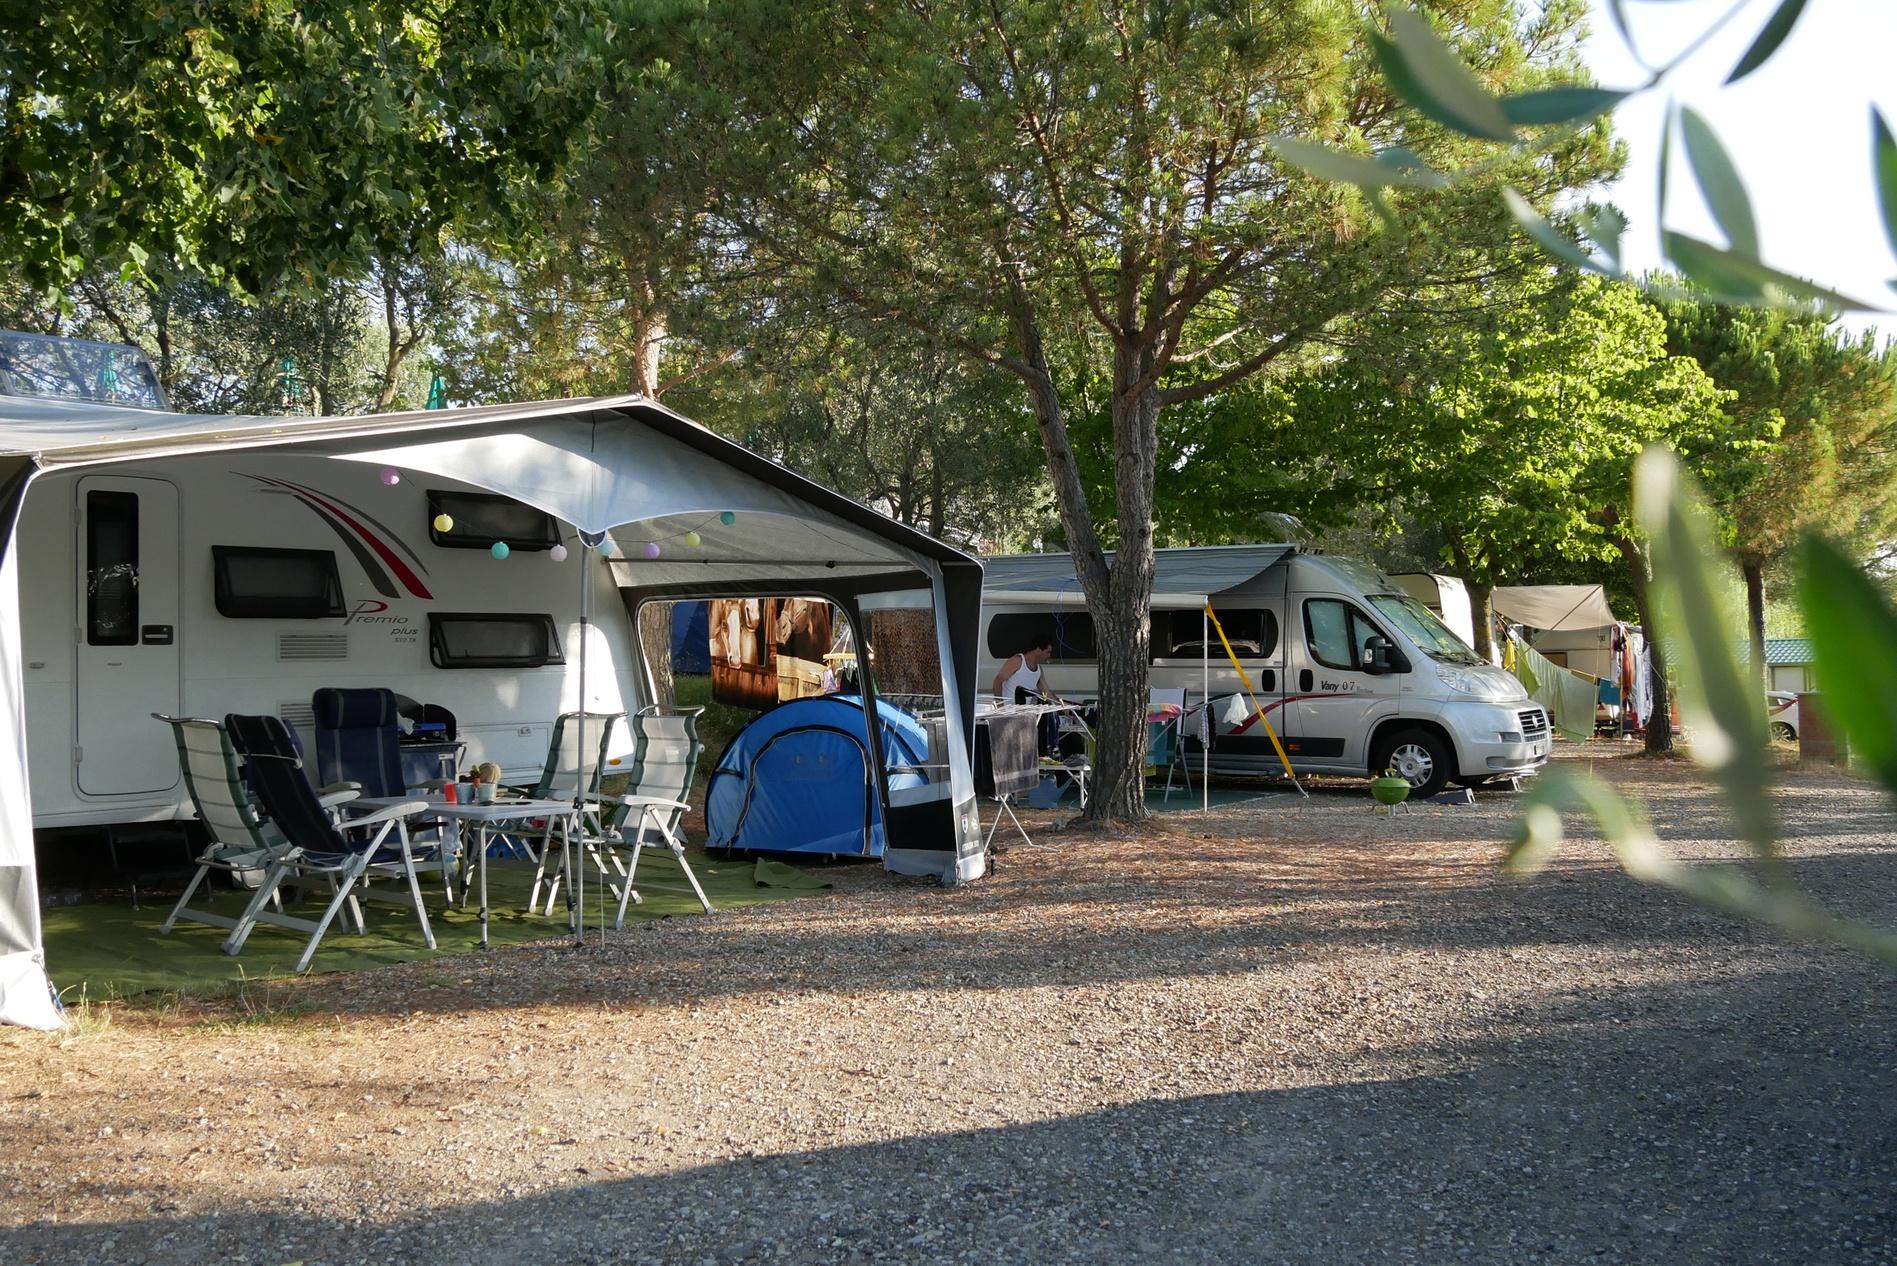 camping le soline toscane itali anwb camping. Black Bedroom Furniture Sets. Home Design Ideas